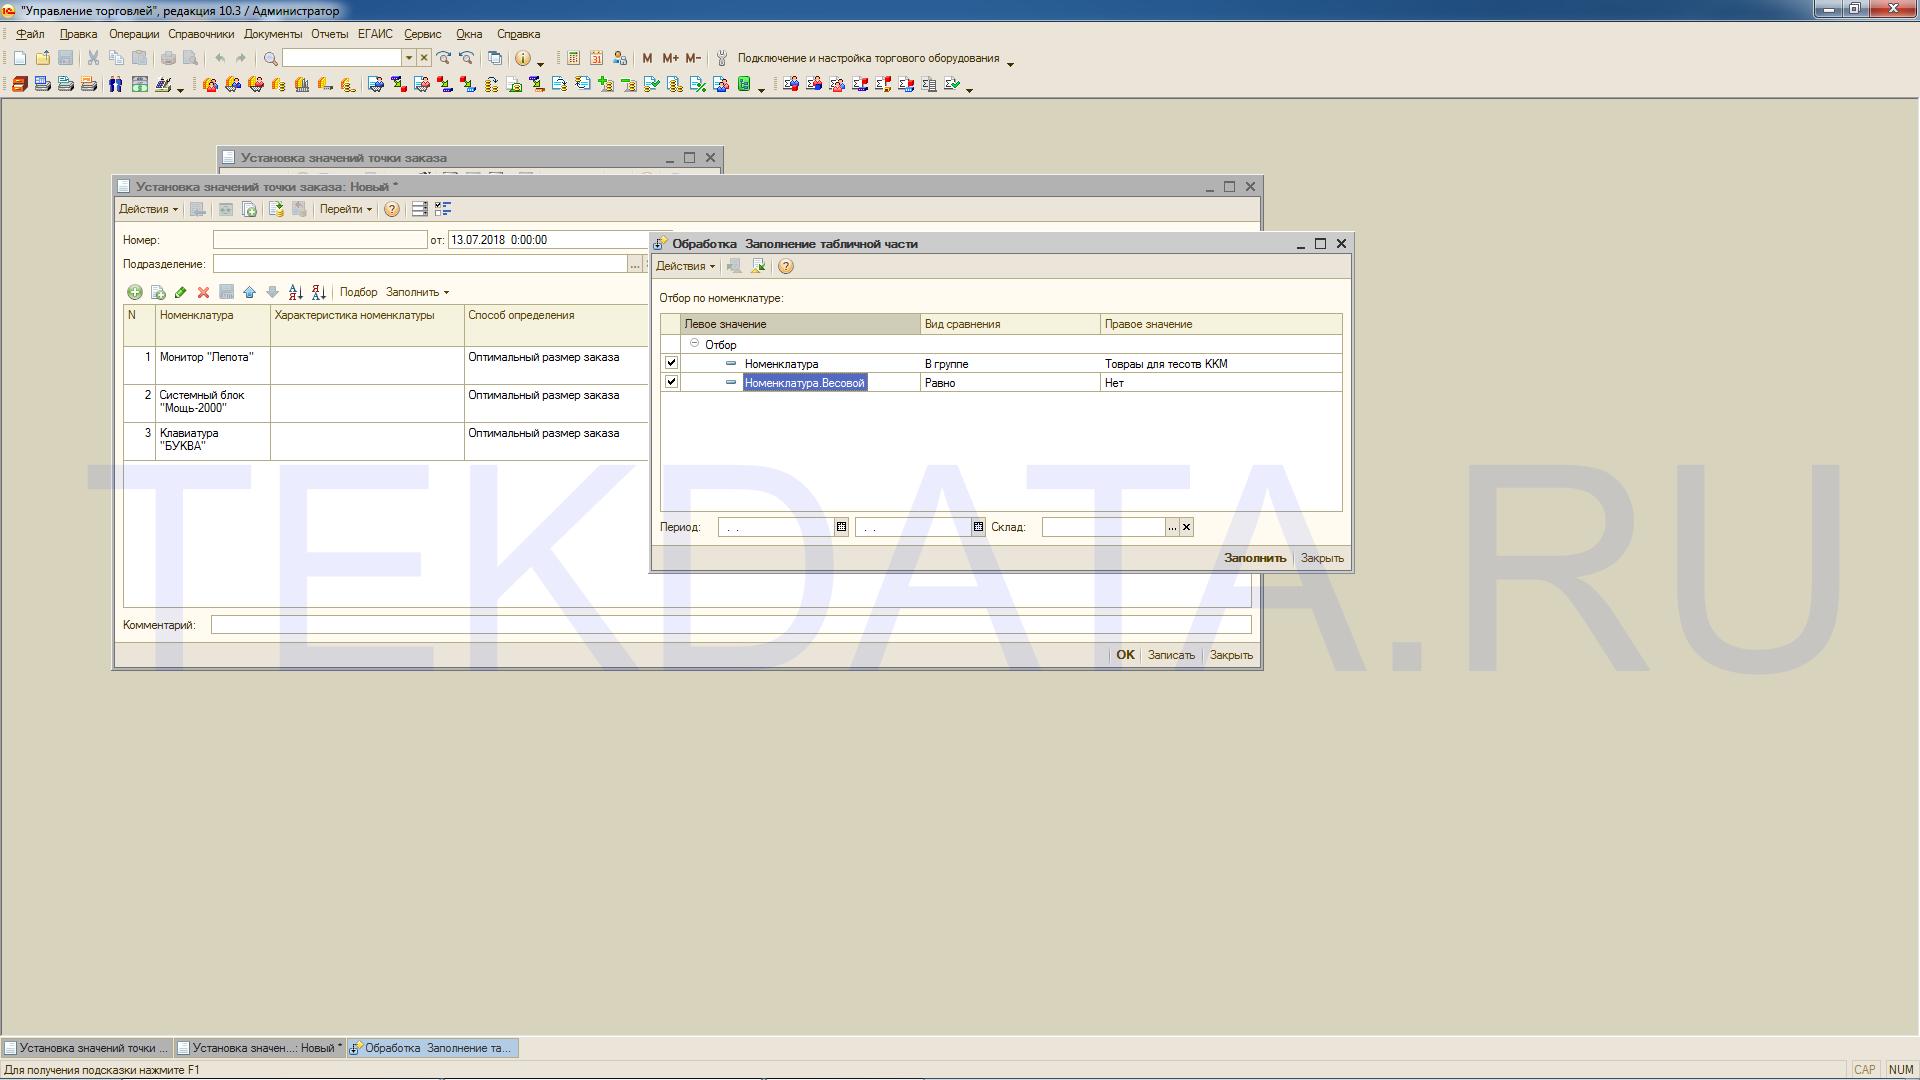 Заполнение документа «Установка значений точки заказа» для УТ 10.3 (внеш. обработка, отбор СКД)